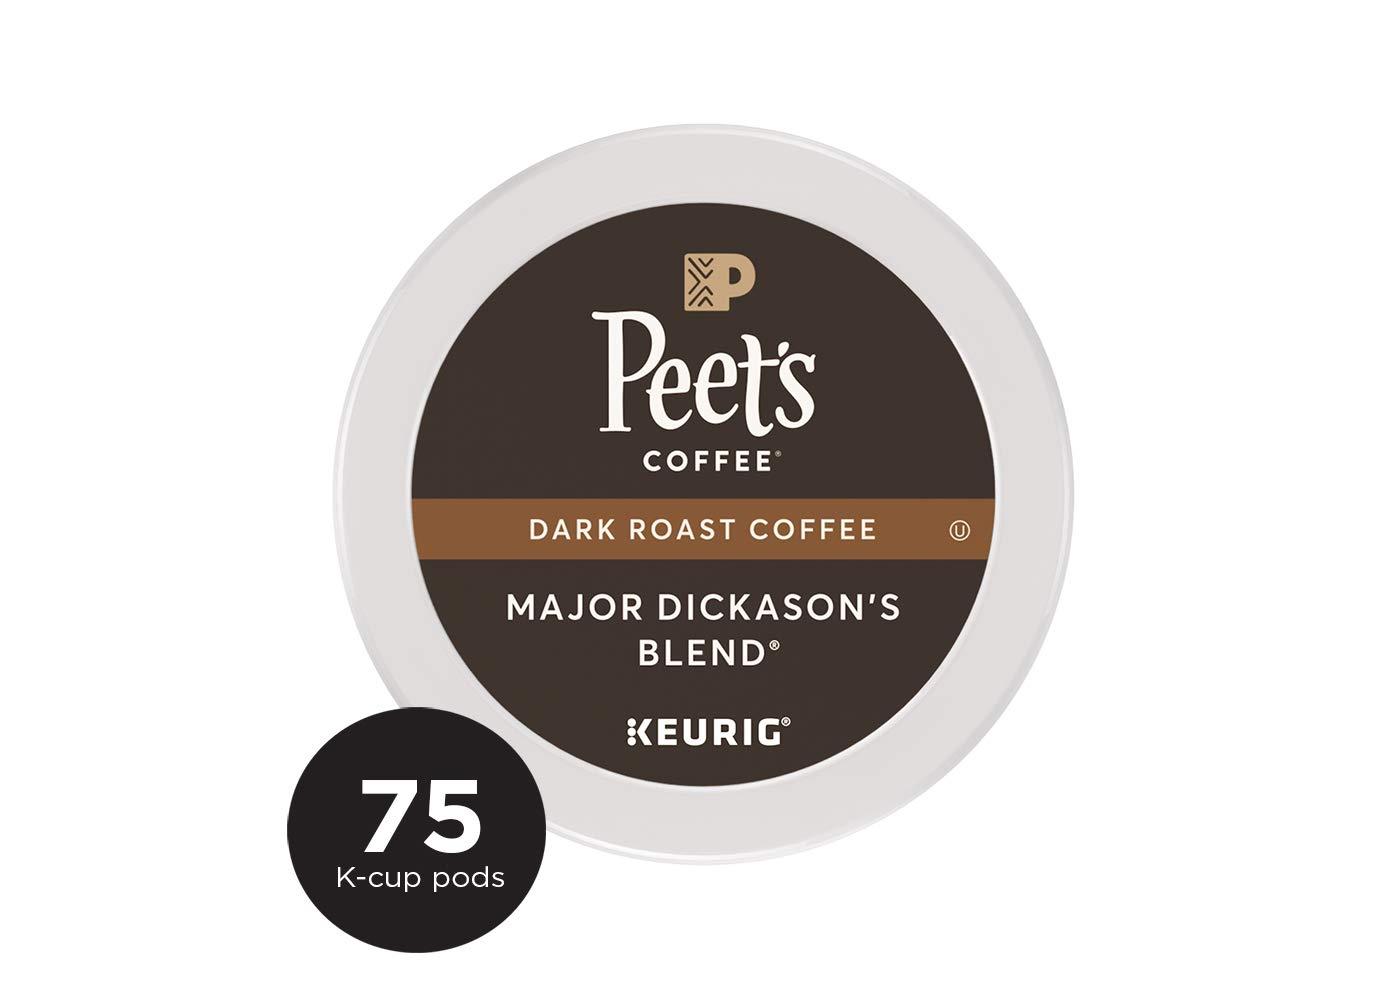 Peet's Coffee Major Dickason's Blend Dark Roast Coffee K-Cup Coffee Pods (75 Count) by Peet's Coffee